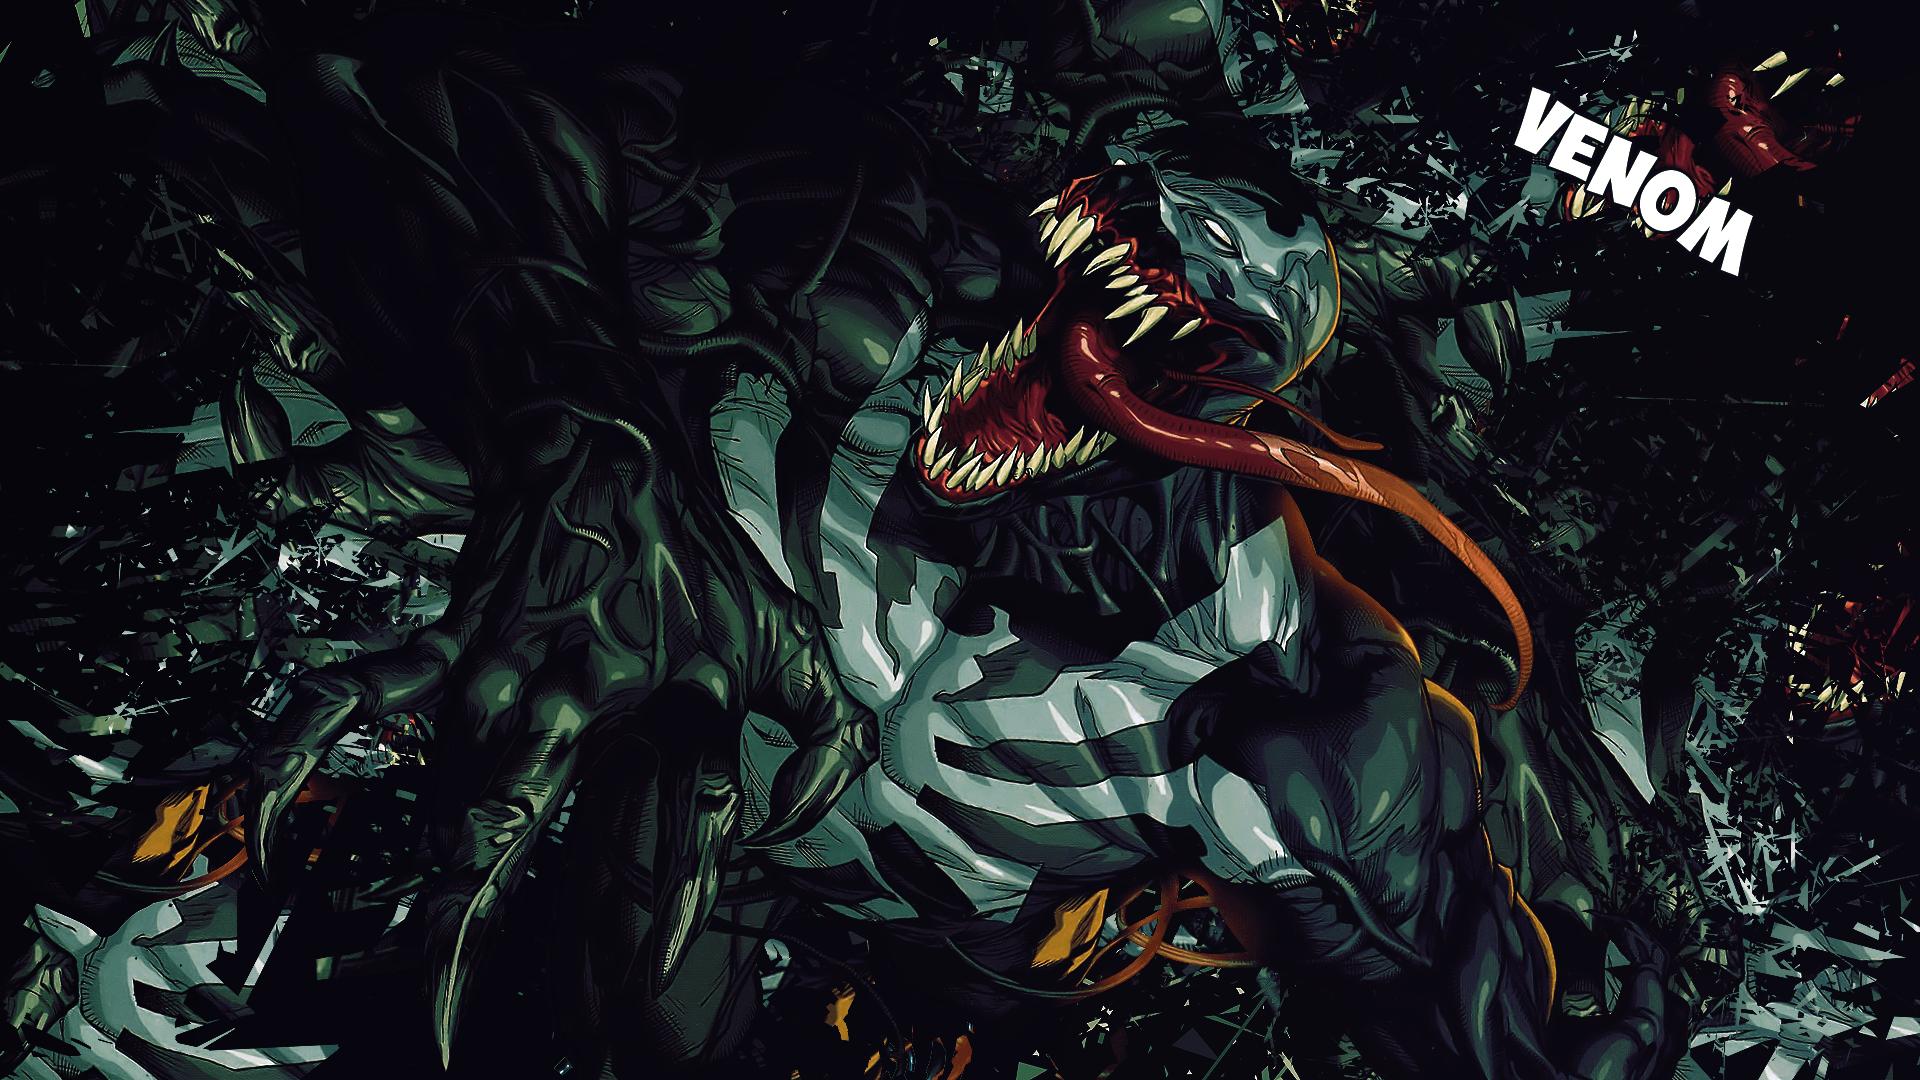 Agent Venom Wallpapers - Wallpaper Cave